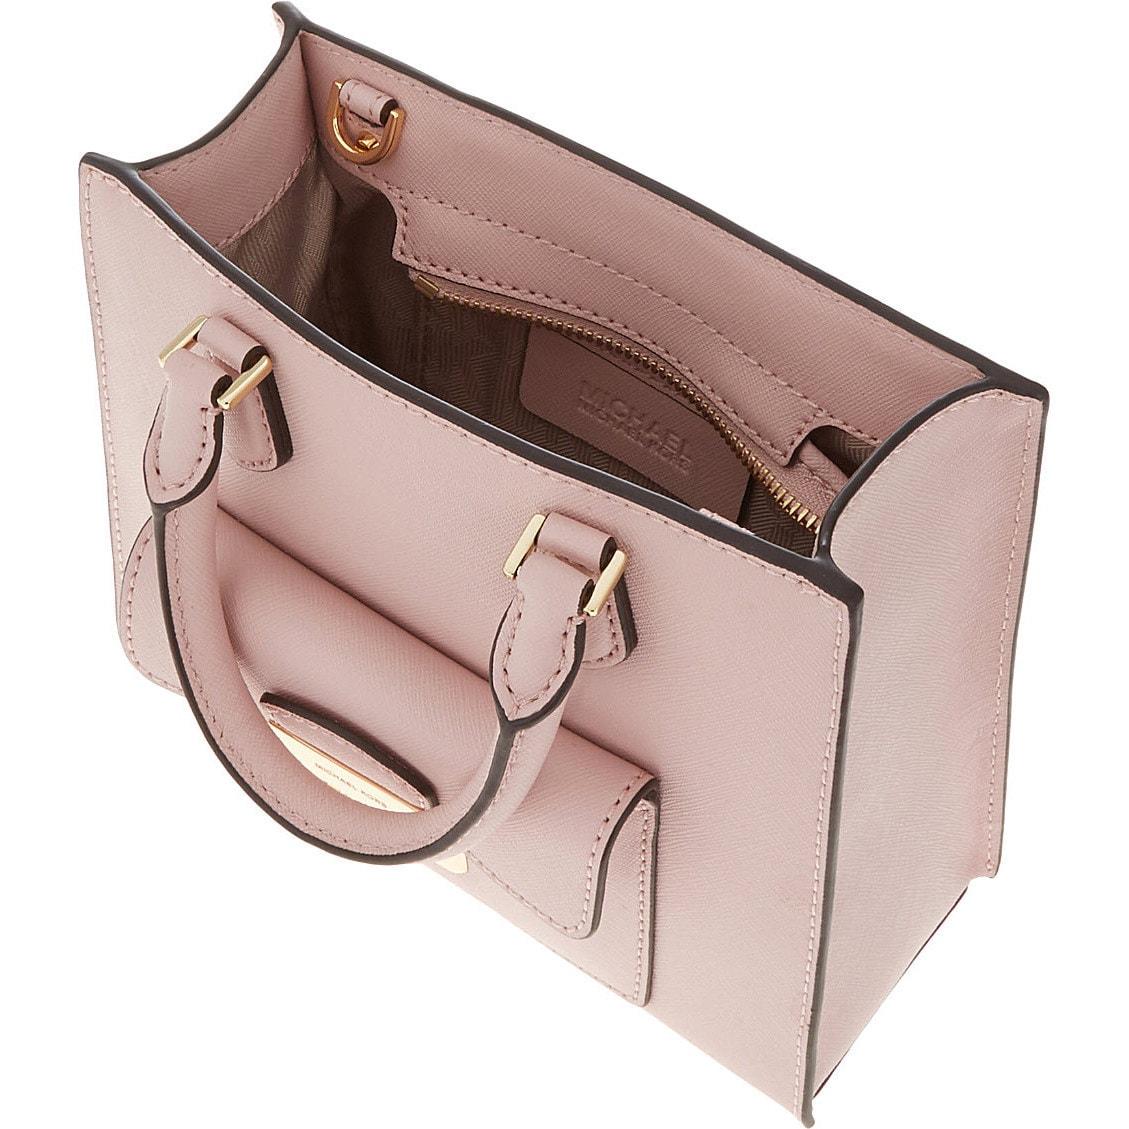 5da0f04db305 Shop Michael Kors Bridgette Blossom Medium East West Saffiano Leather Tote  Bag - Free Shipping Today - Overstock - 12068523